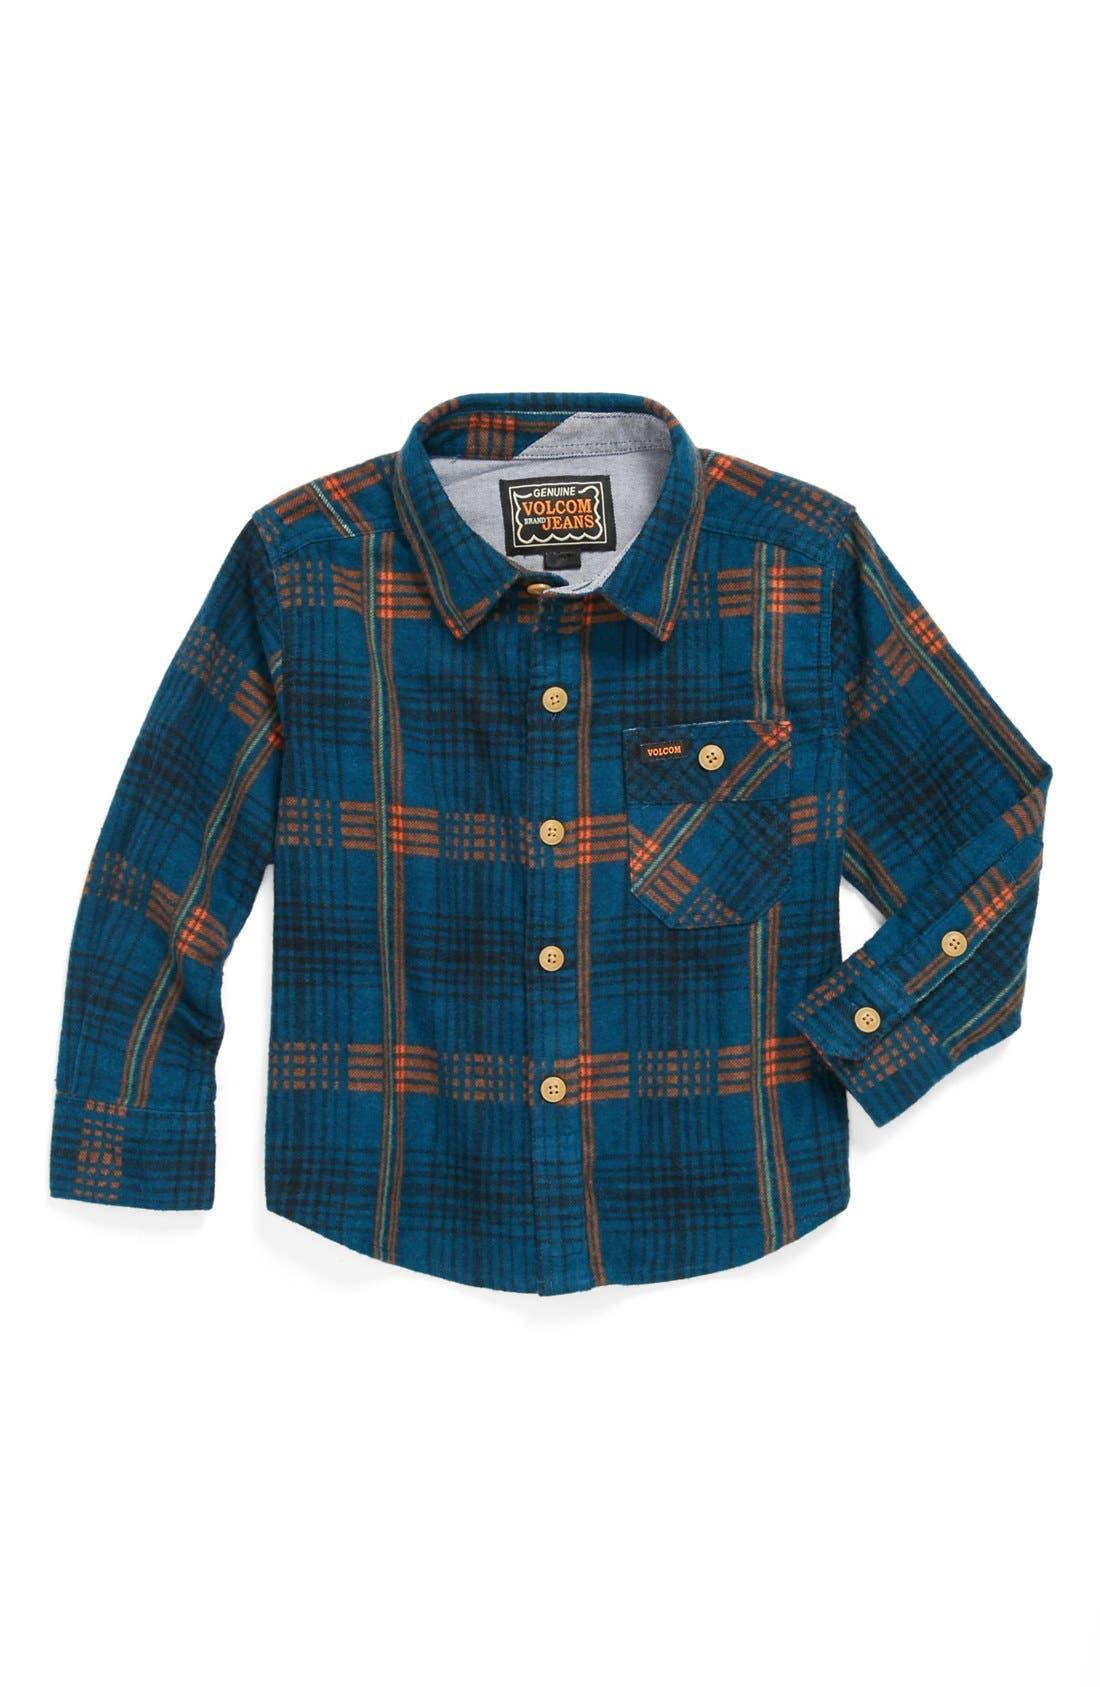 Alternate Image 1 Selected - Volcom 'Harry' Plaid Shirt (Toddler Boys)